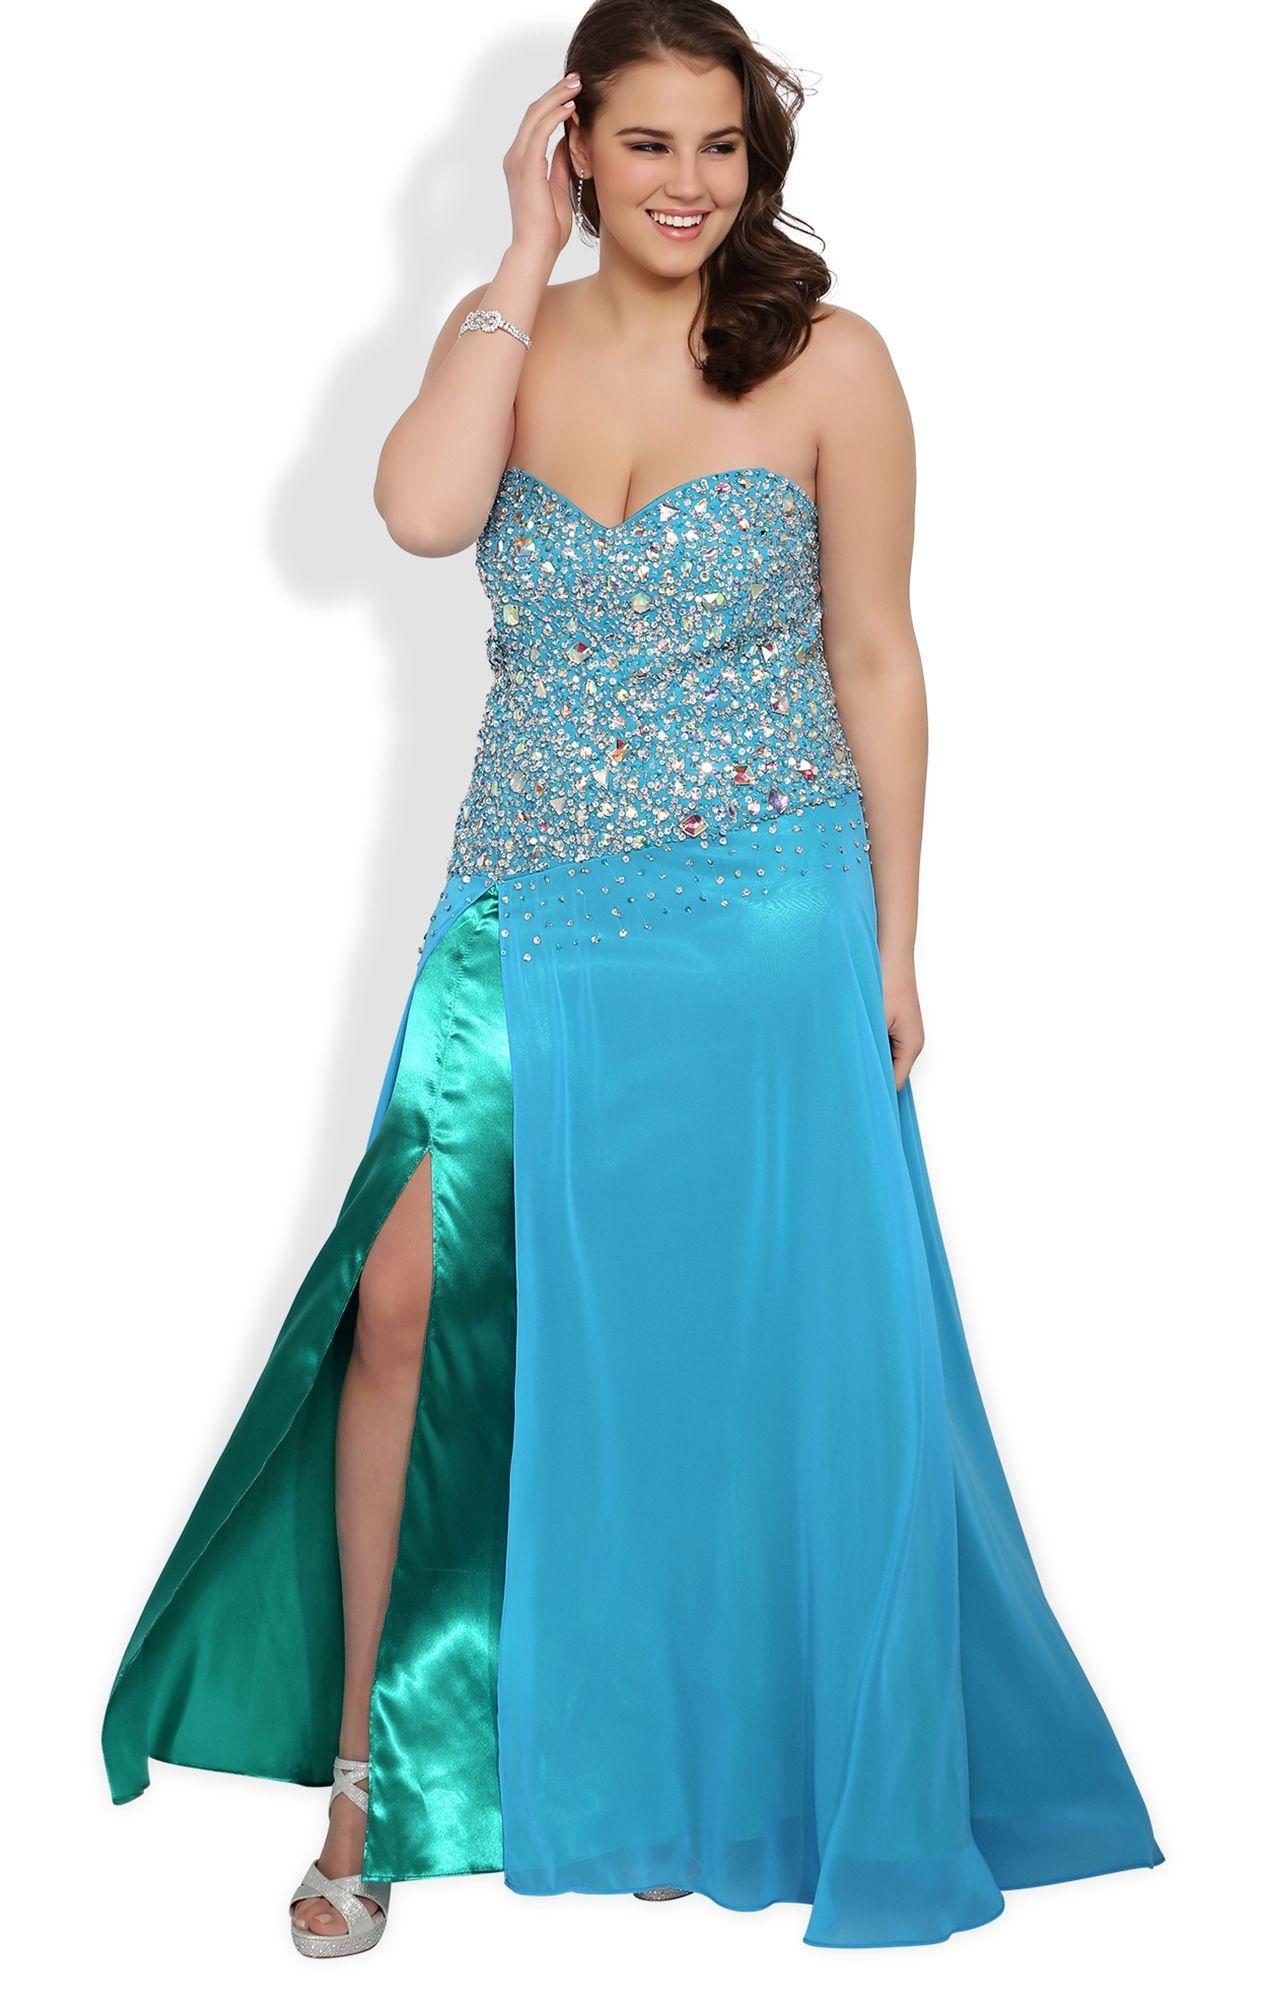 Debs Plus Size Homecoming Dresses | Huston Fislar Photography